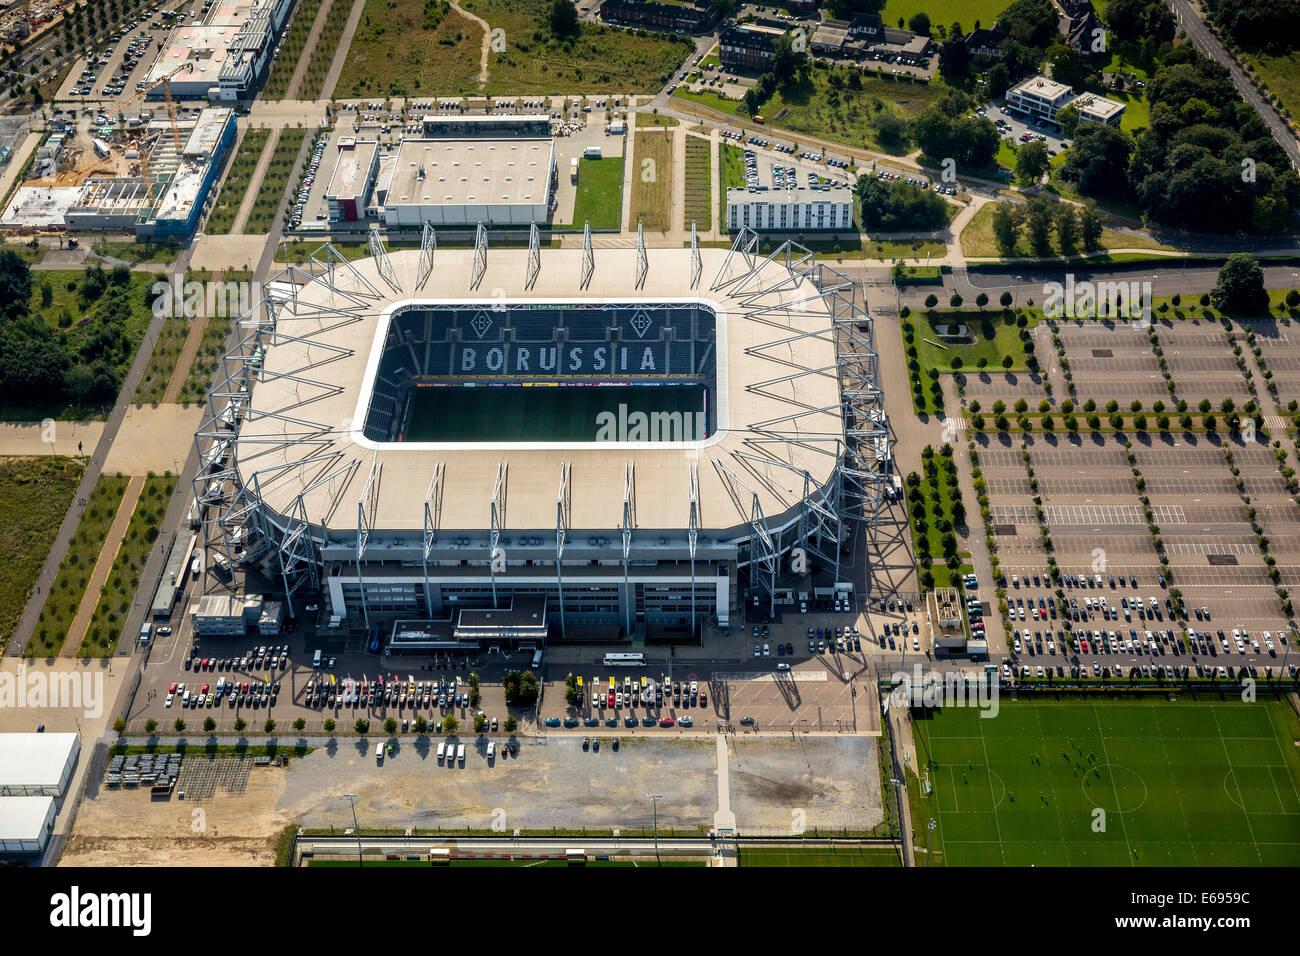 Aerial view, Borussia-Park, football stadium, Mönchengladbach, North Rhine-Westphalia, Germany - Stock Image